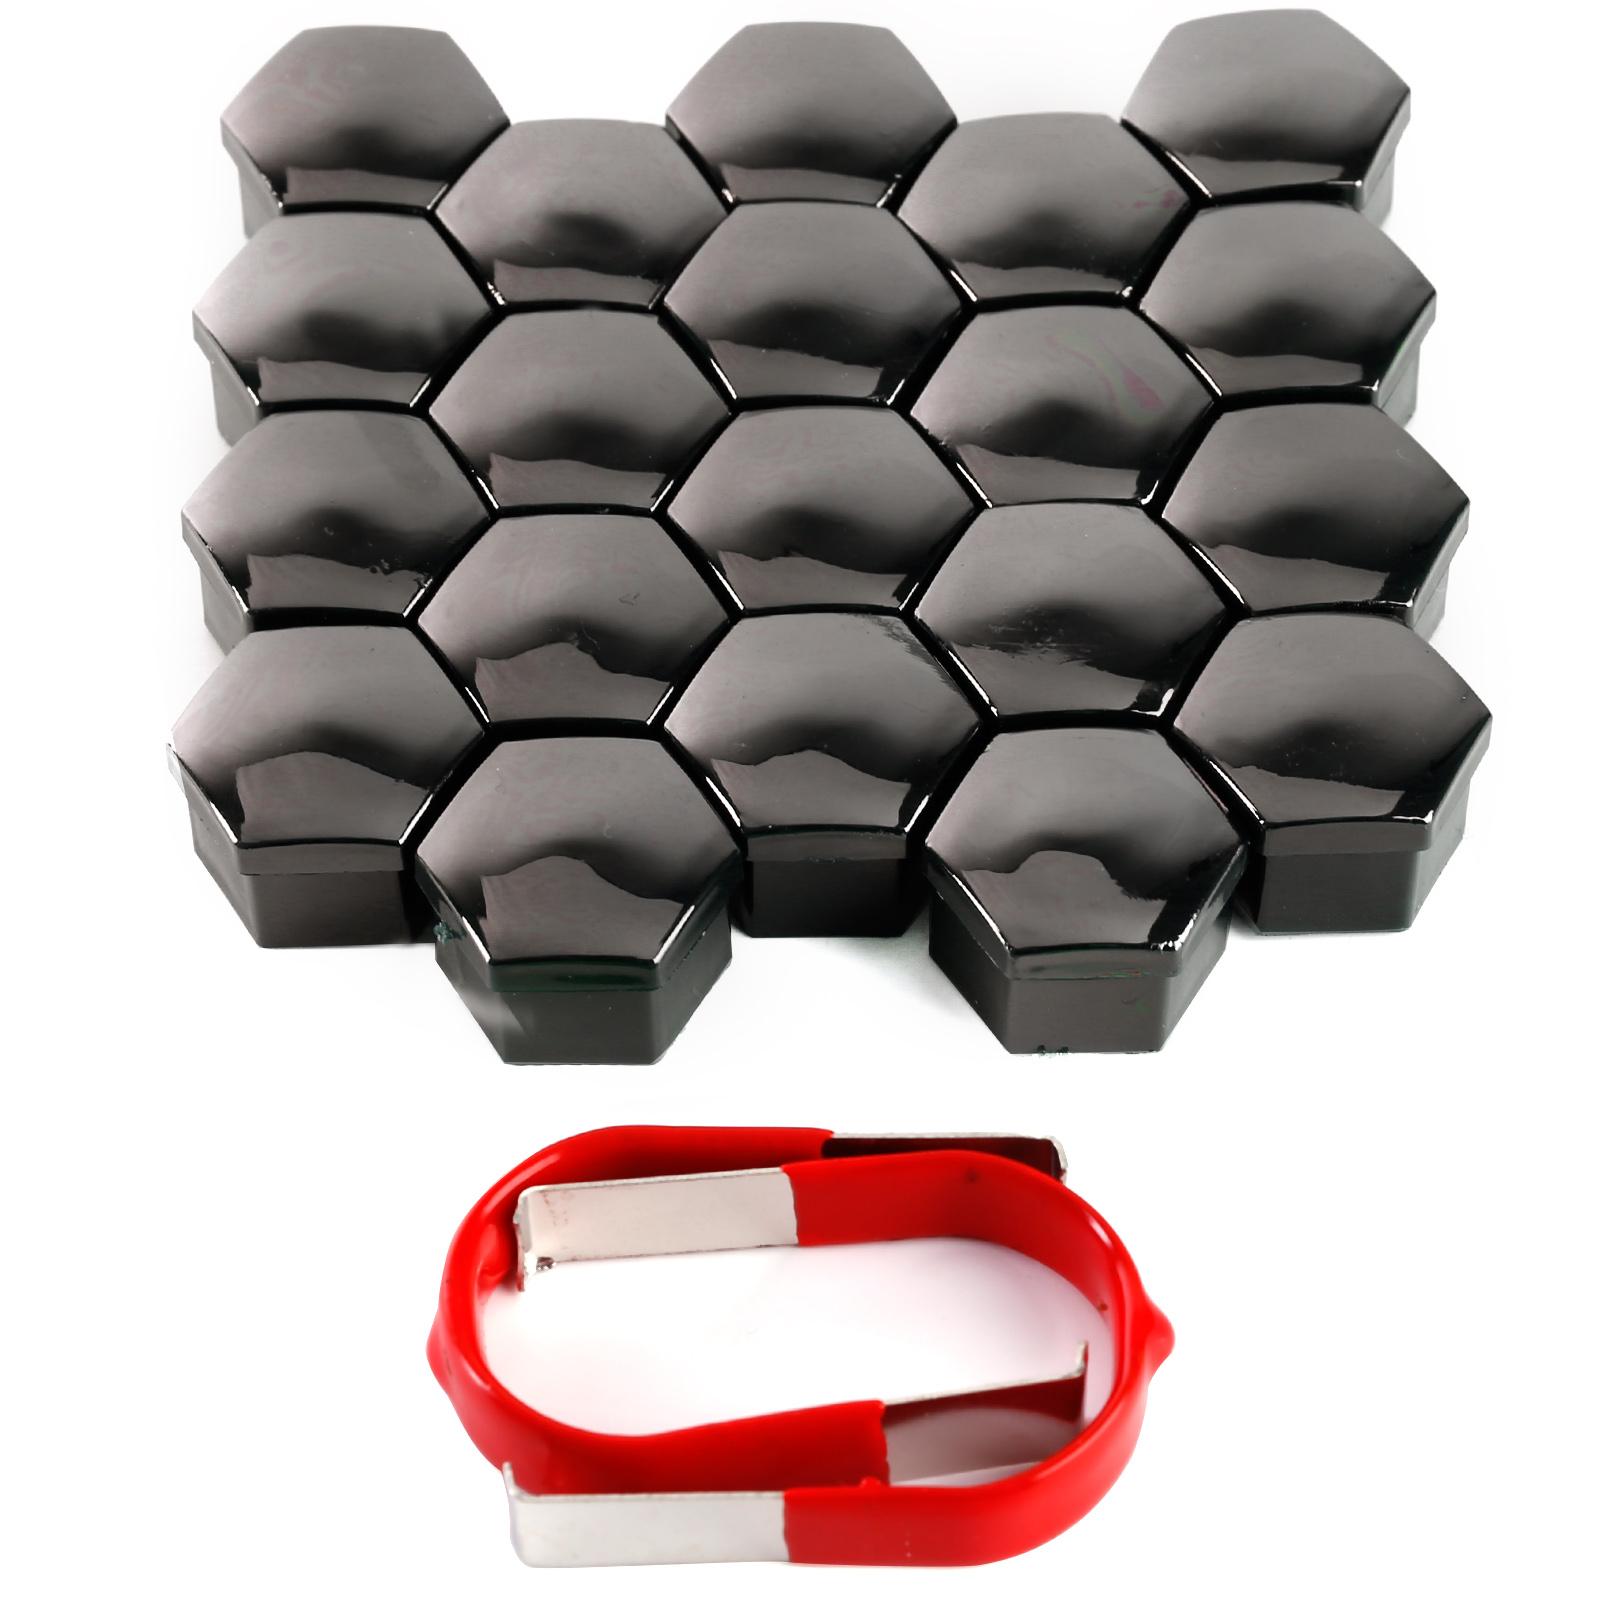 20 X 17mm 19mm Chrome Alloy Wheel Nuts Lugs Bolts Cap